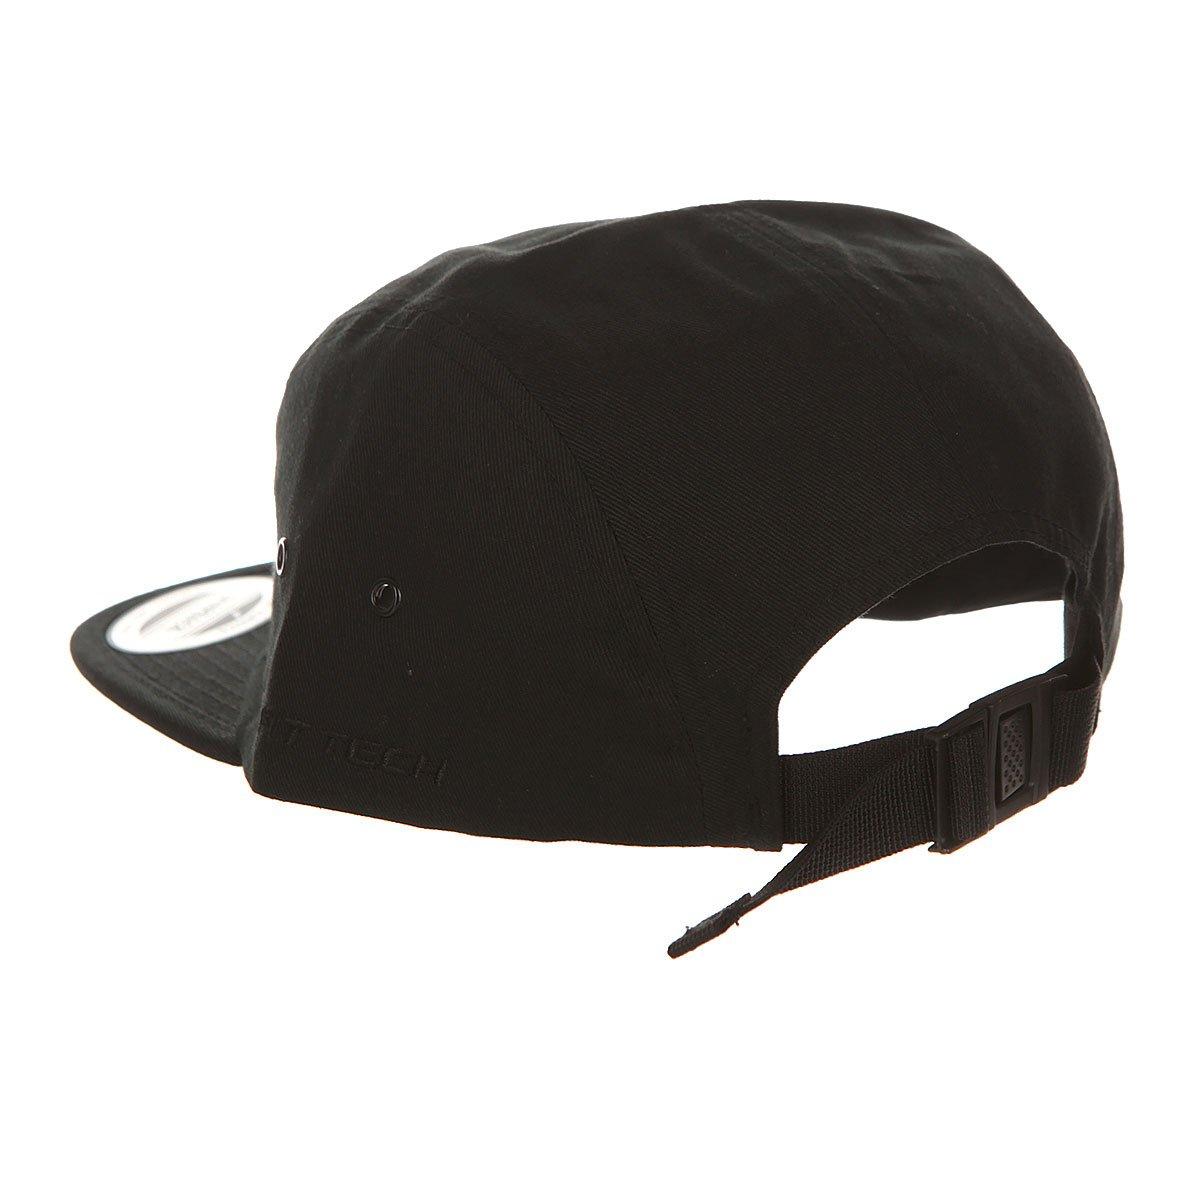 Бейсболка пятипанелька Flexfit 7005 Black